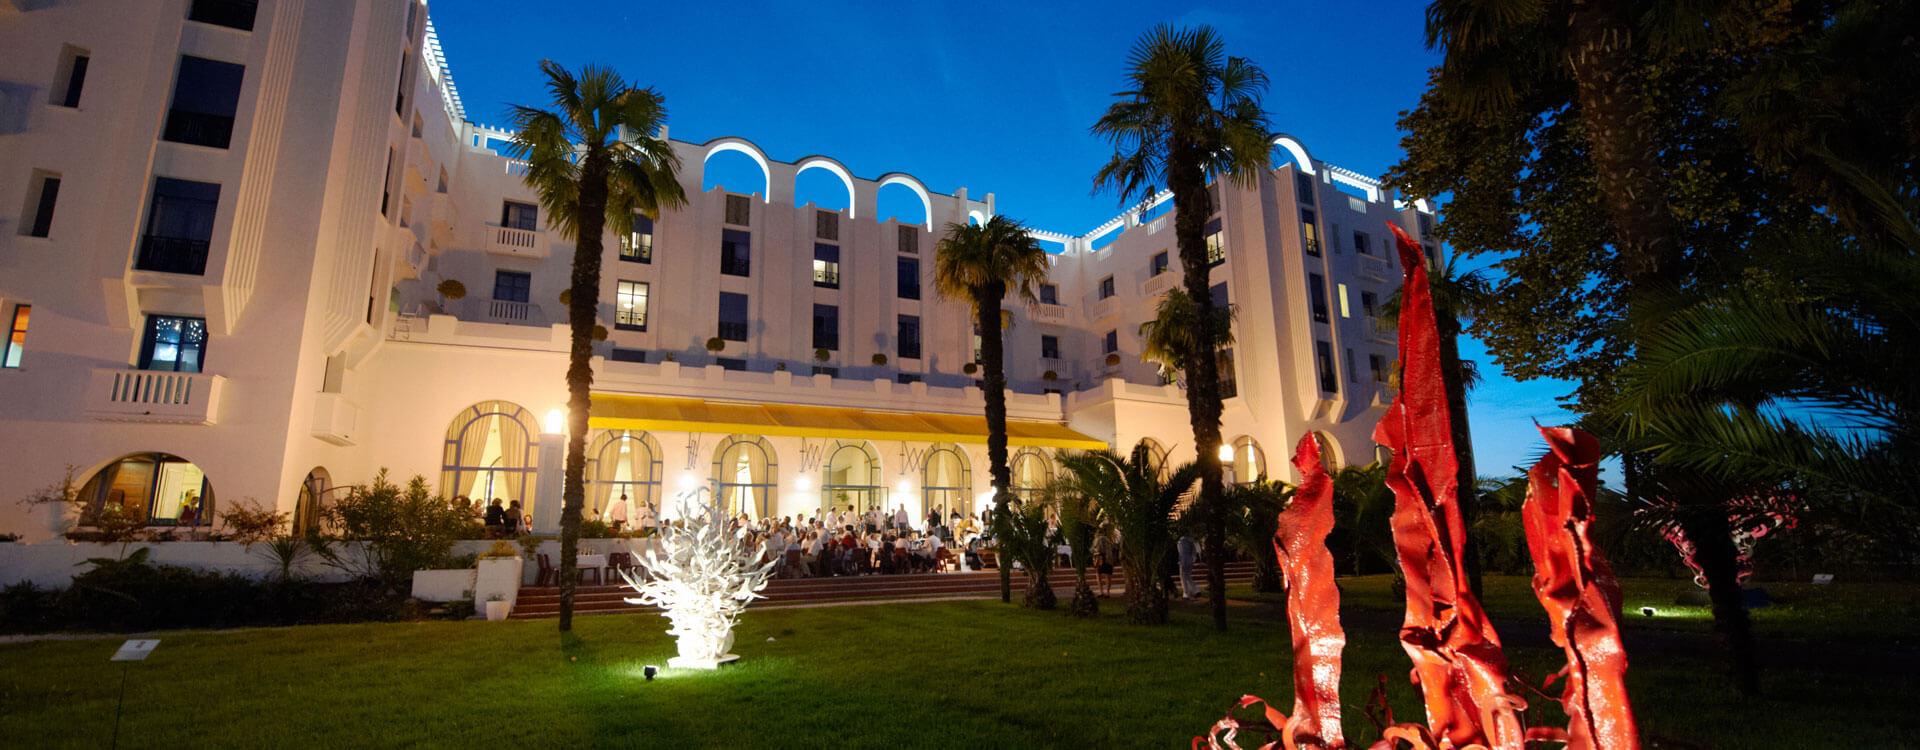 Hôtel et spa**** Splendid à Dax